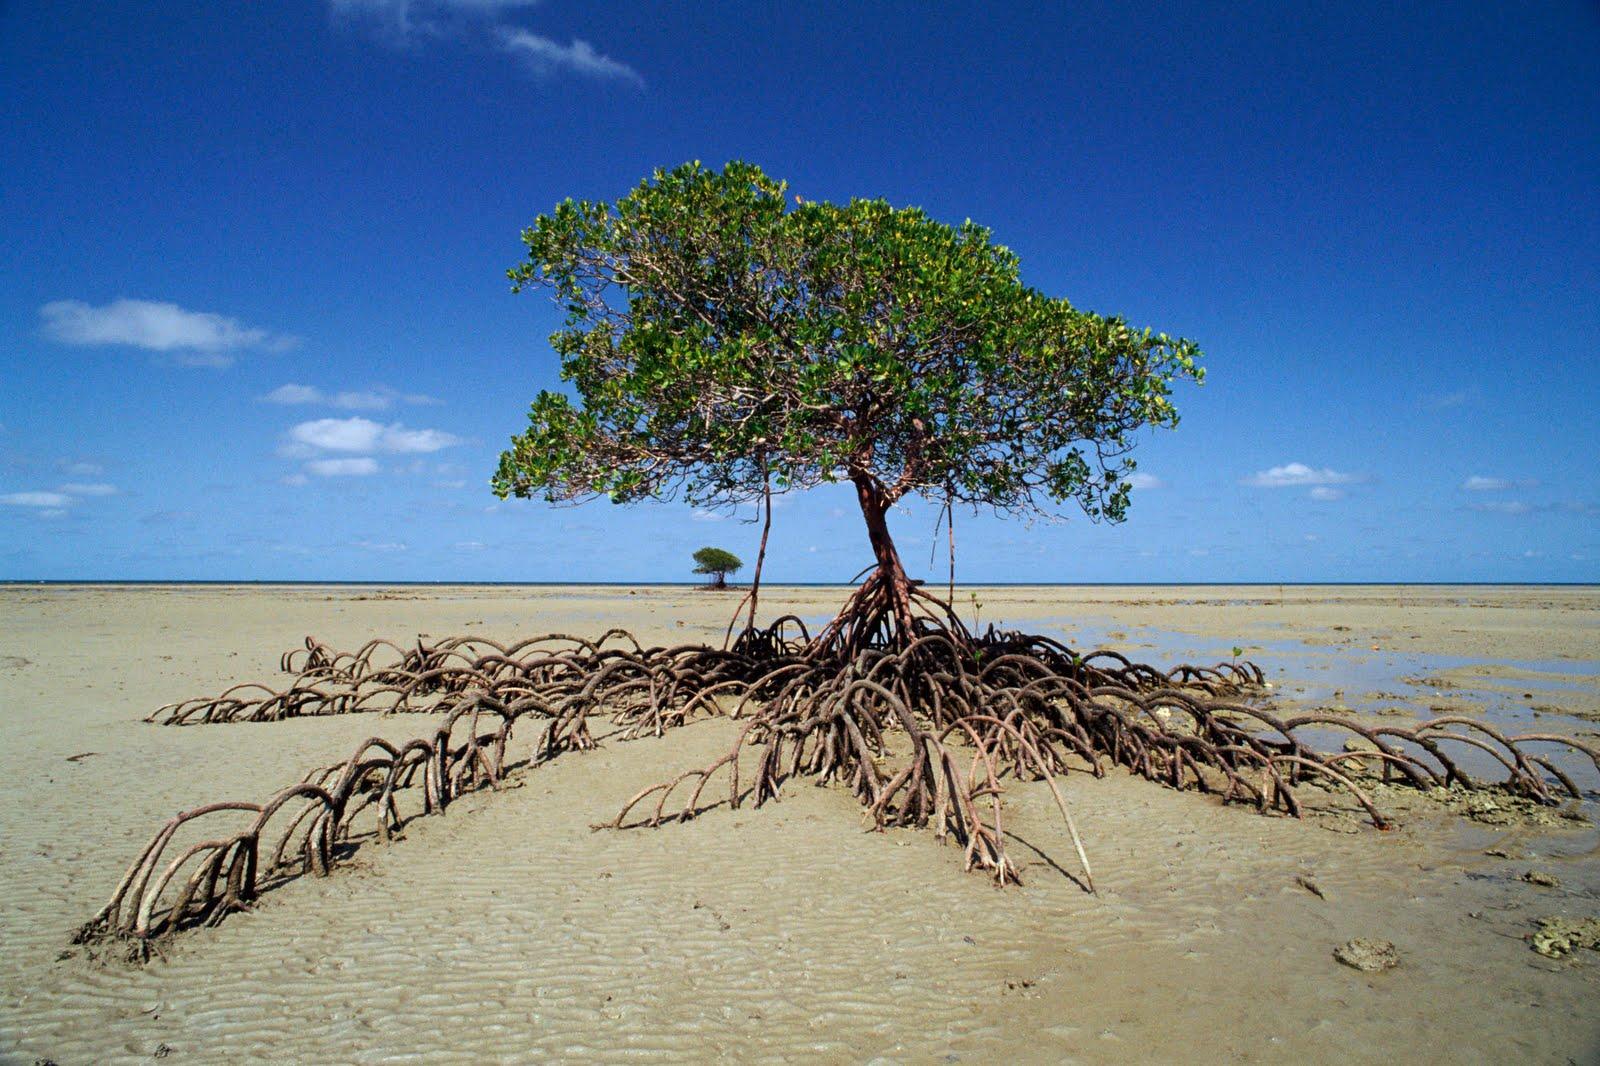 Monami frost 1438 808 wallpaper -  4 Mangrove Tree Wallpapers Hd Wallpaper Free 3979